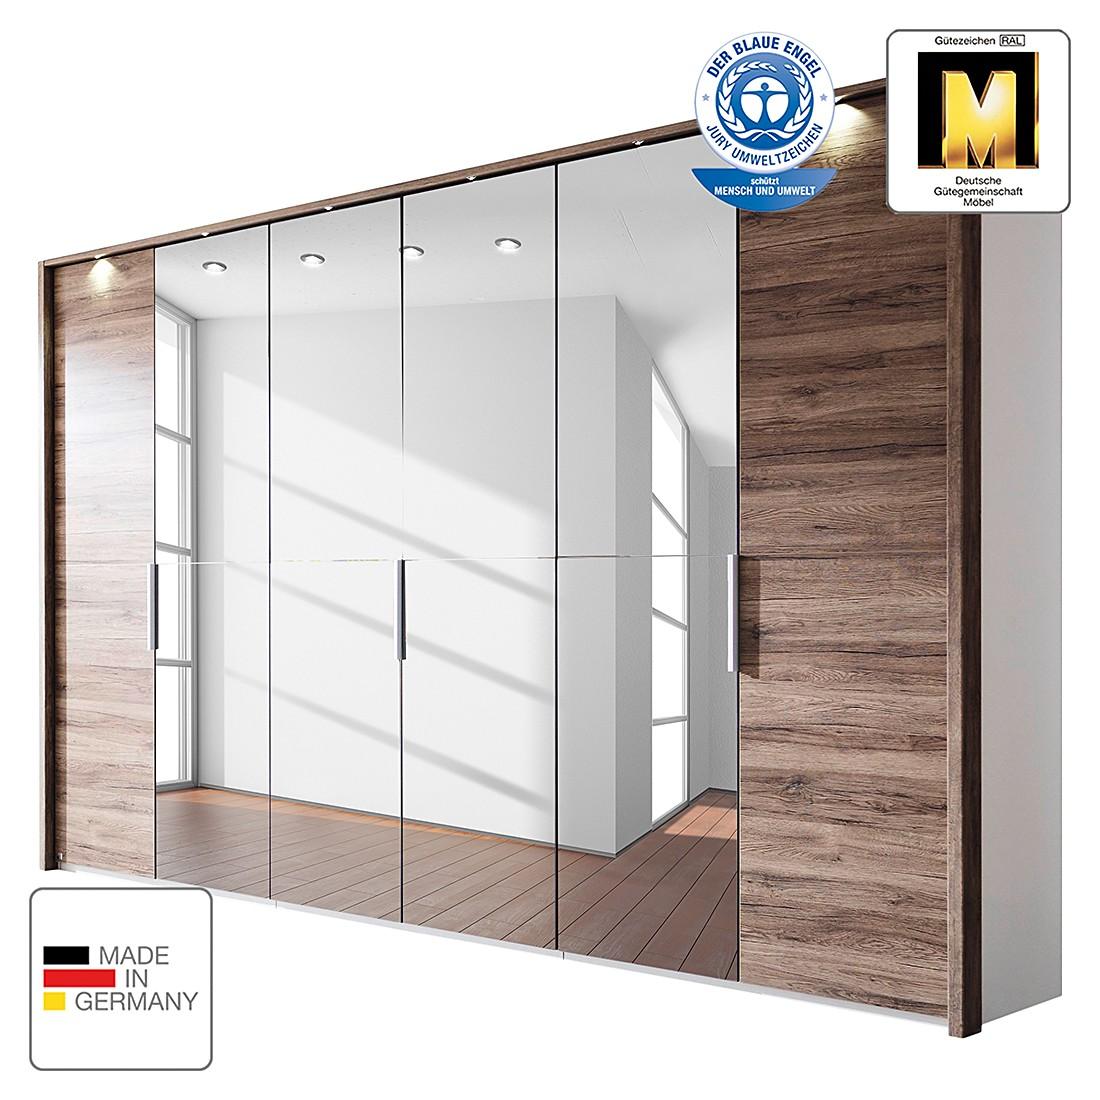 energie  A+, Draaideurkast Vadora - donkere San Remo eikenhouten look - 151cm (3-deurs) - Met verlichte Passe-partout lijst, Rauch Steffen